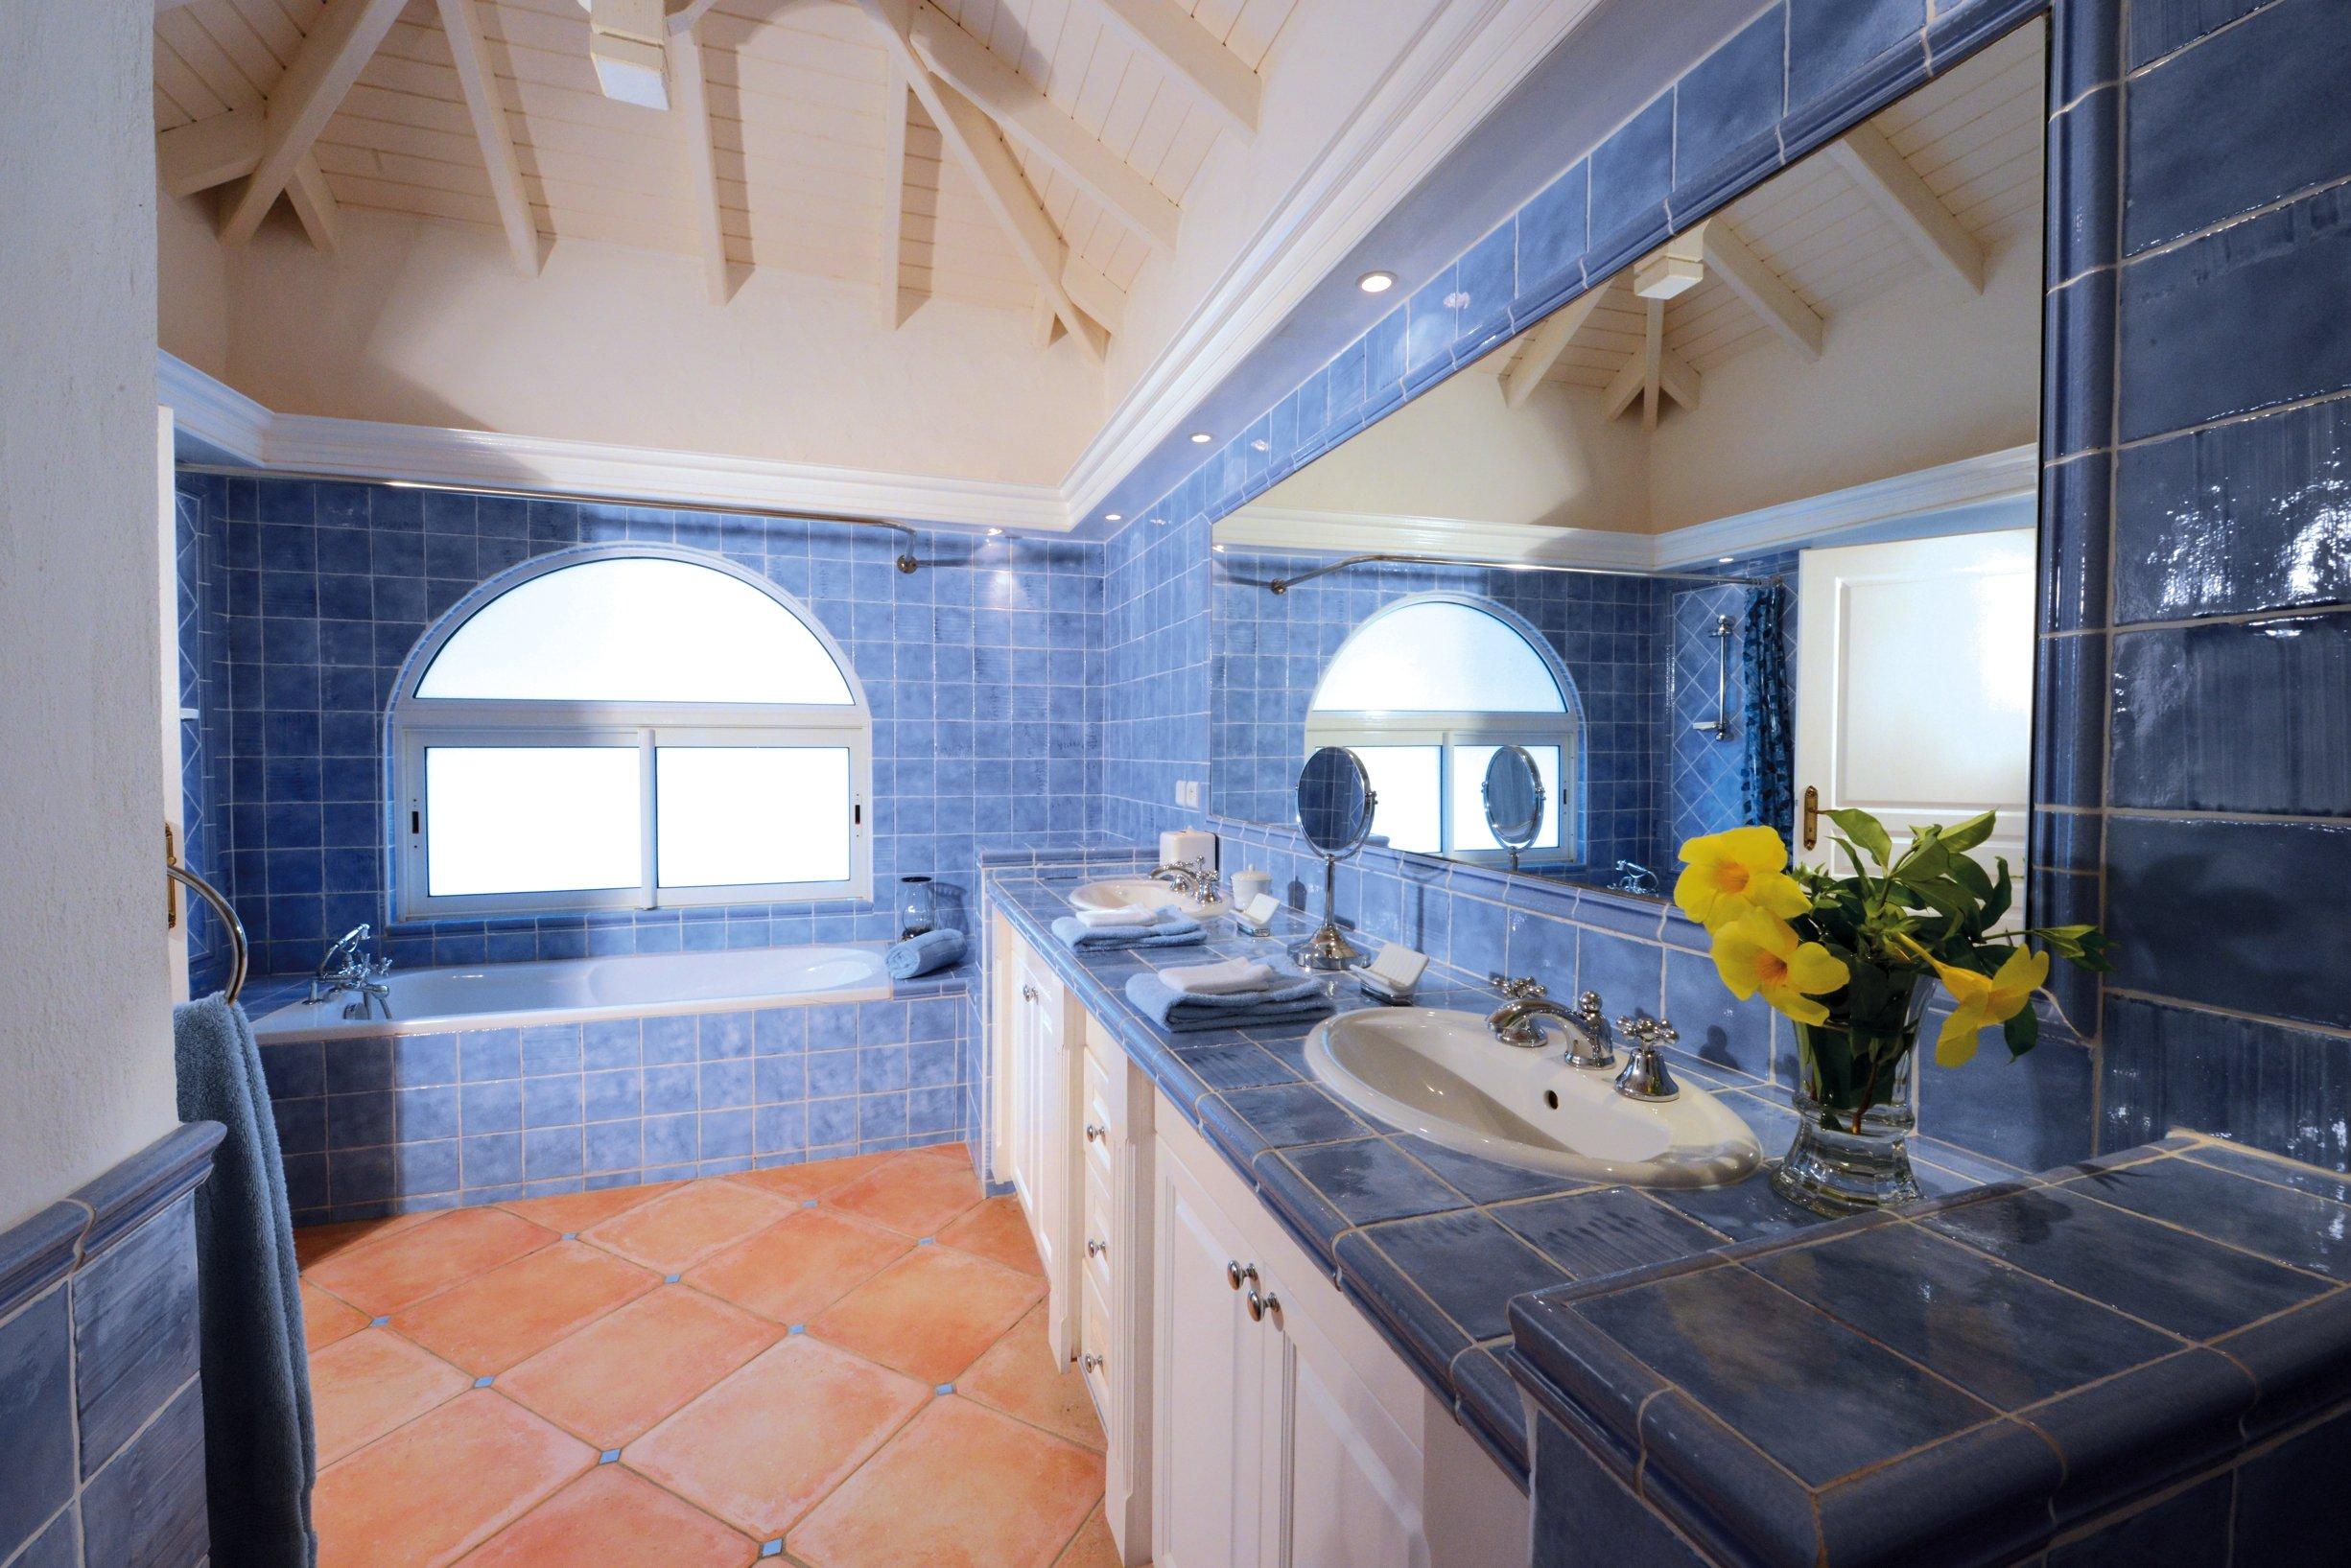 Luxury 12 bedroom Caribbean Estate for rent overlooking Baie Longue Beach St. Martin